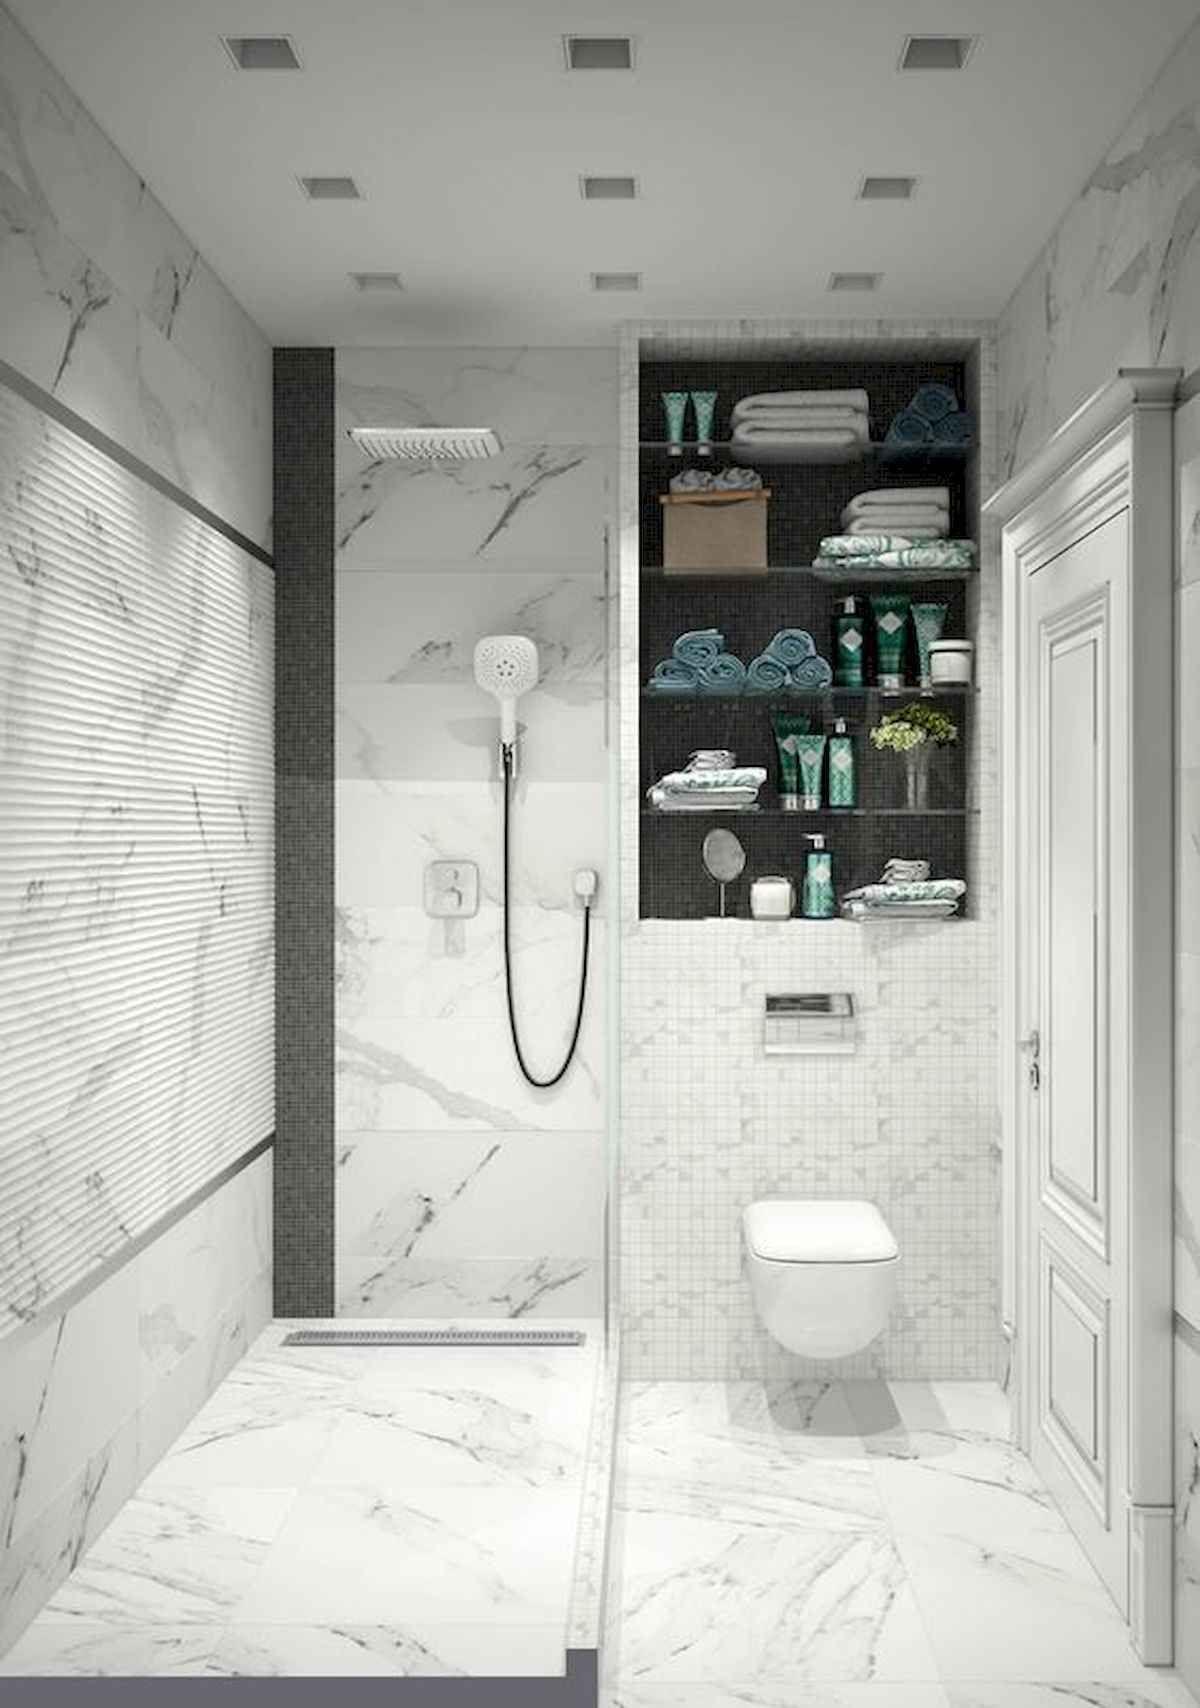 50 stunning small bathroom makeover ideas 37 small on stunning small bathroom design ideas id=68806